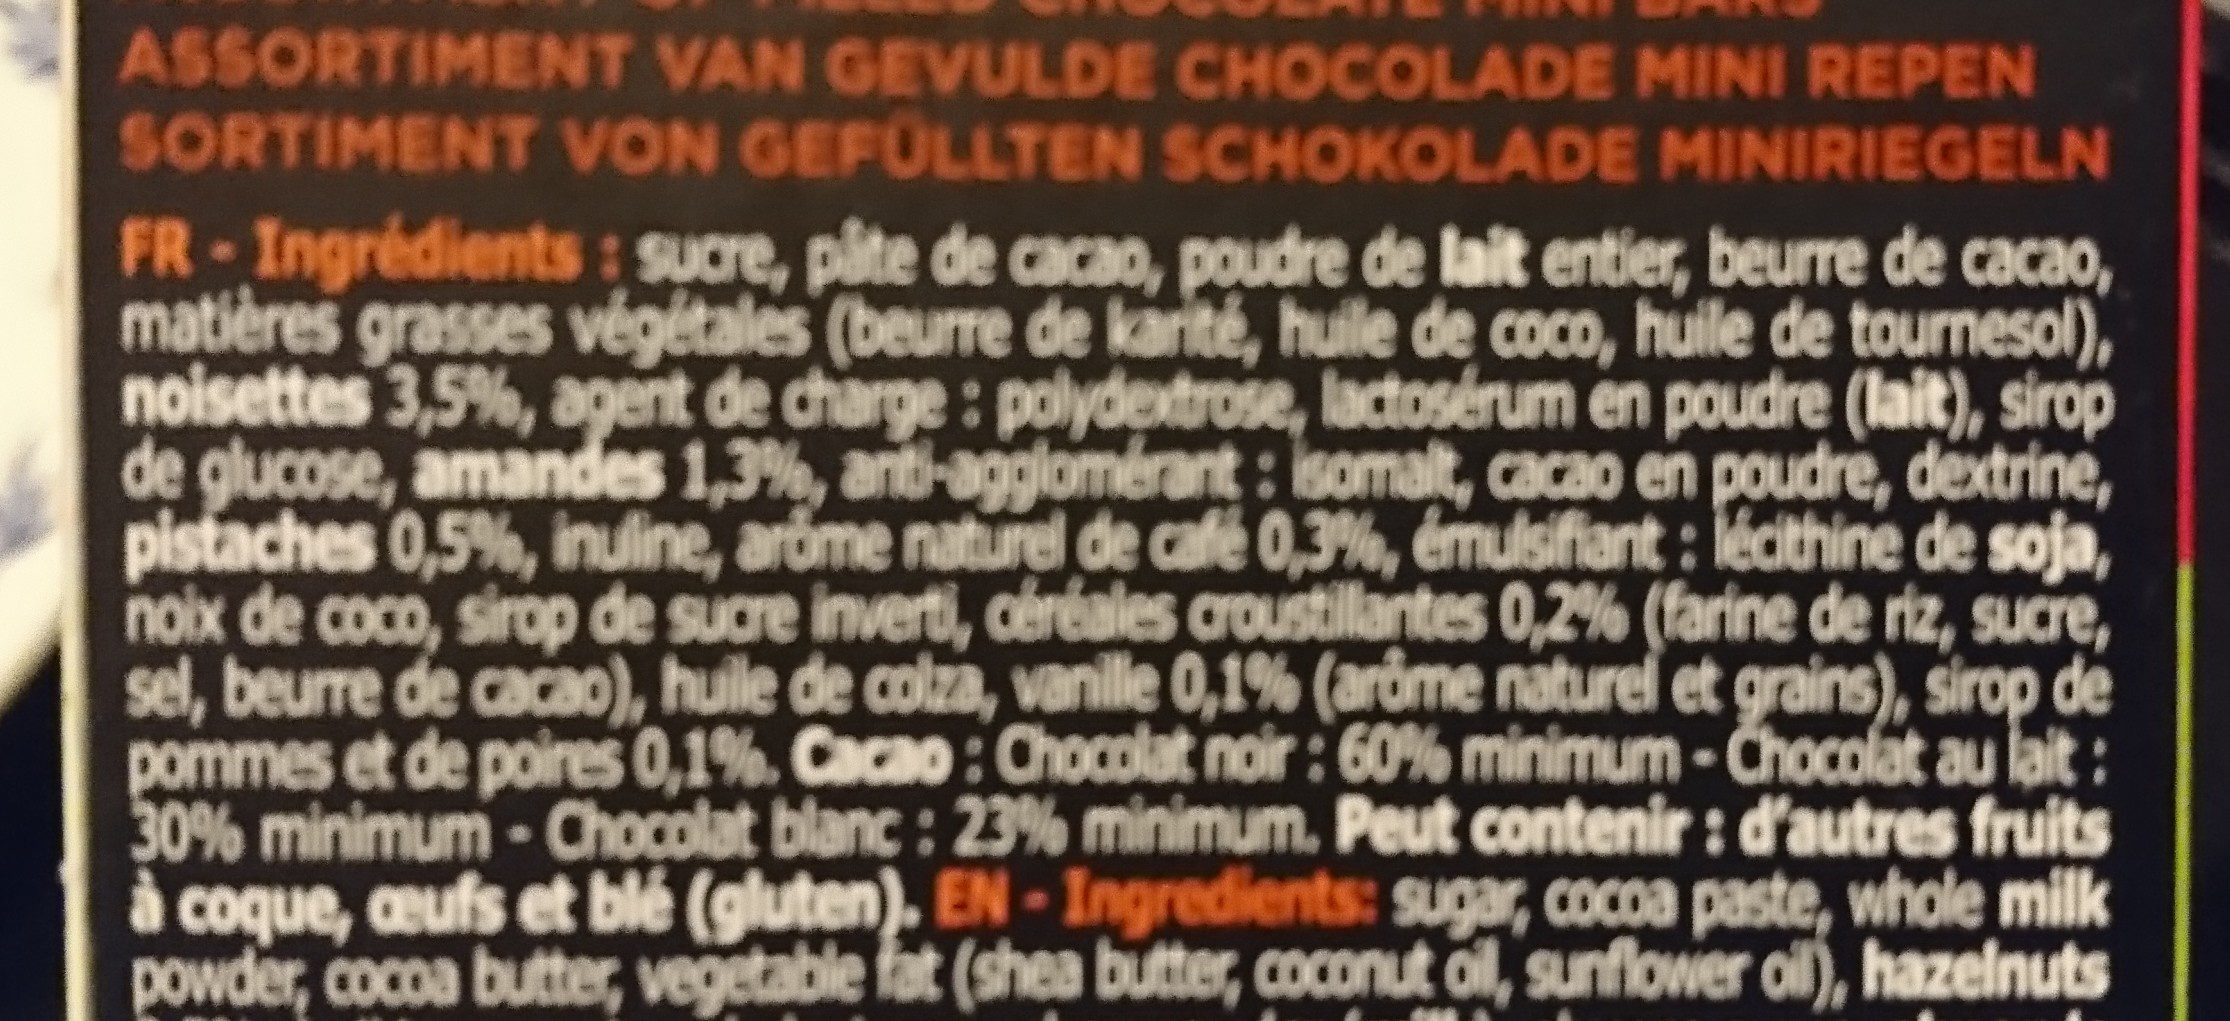 Assortiment de mini bâtons au chocolat fourrés - Ingrediënten - fr